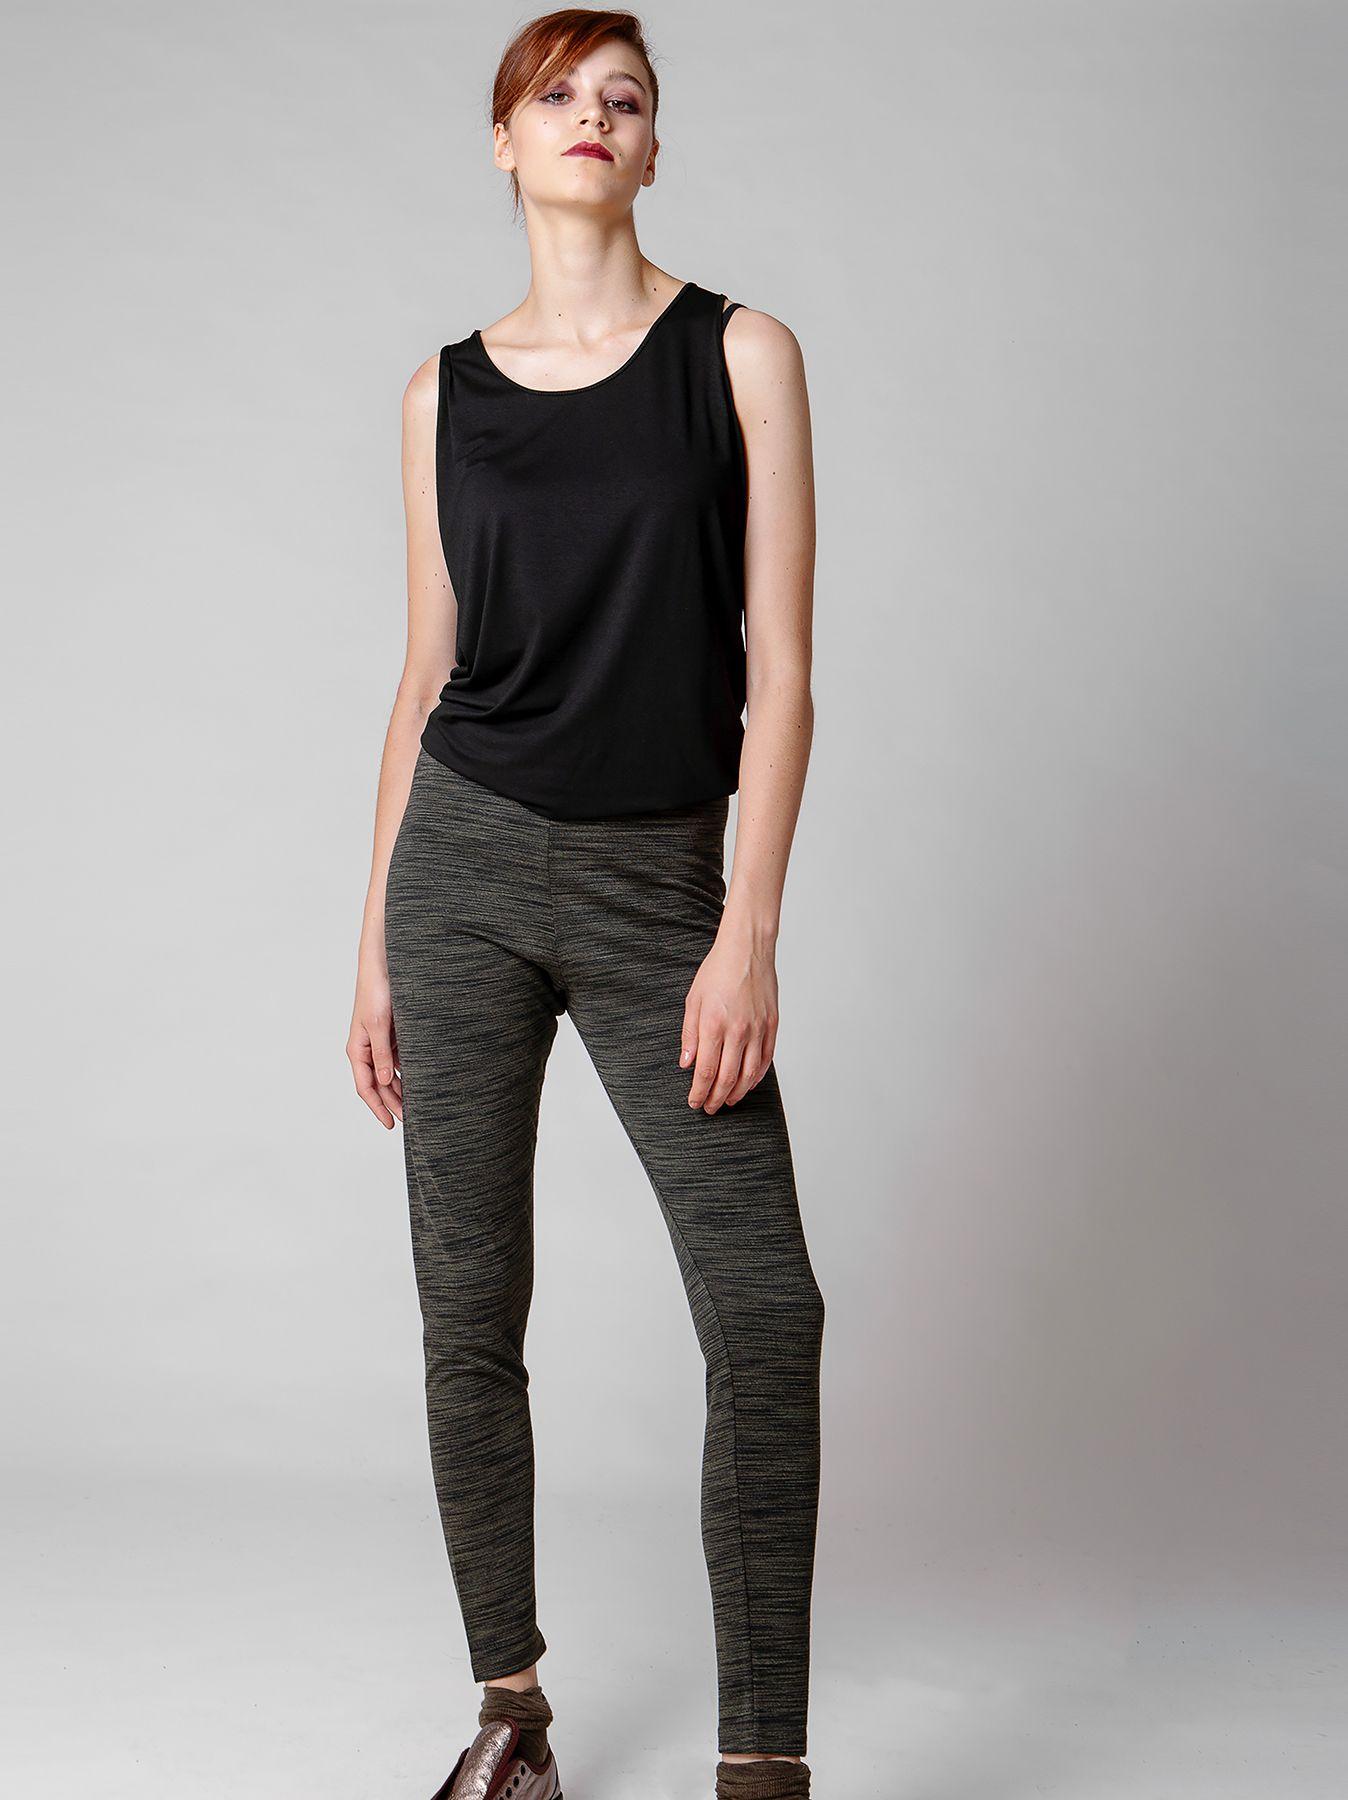 Pantalone aderente